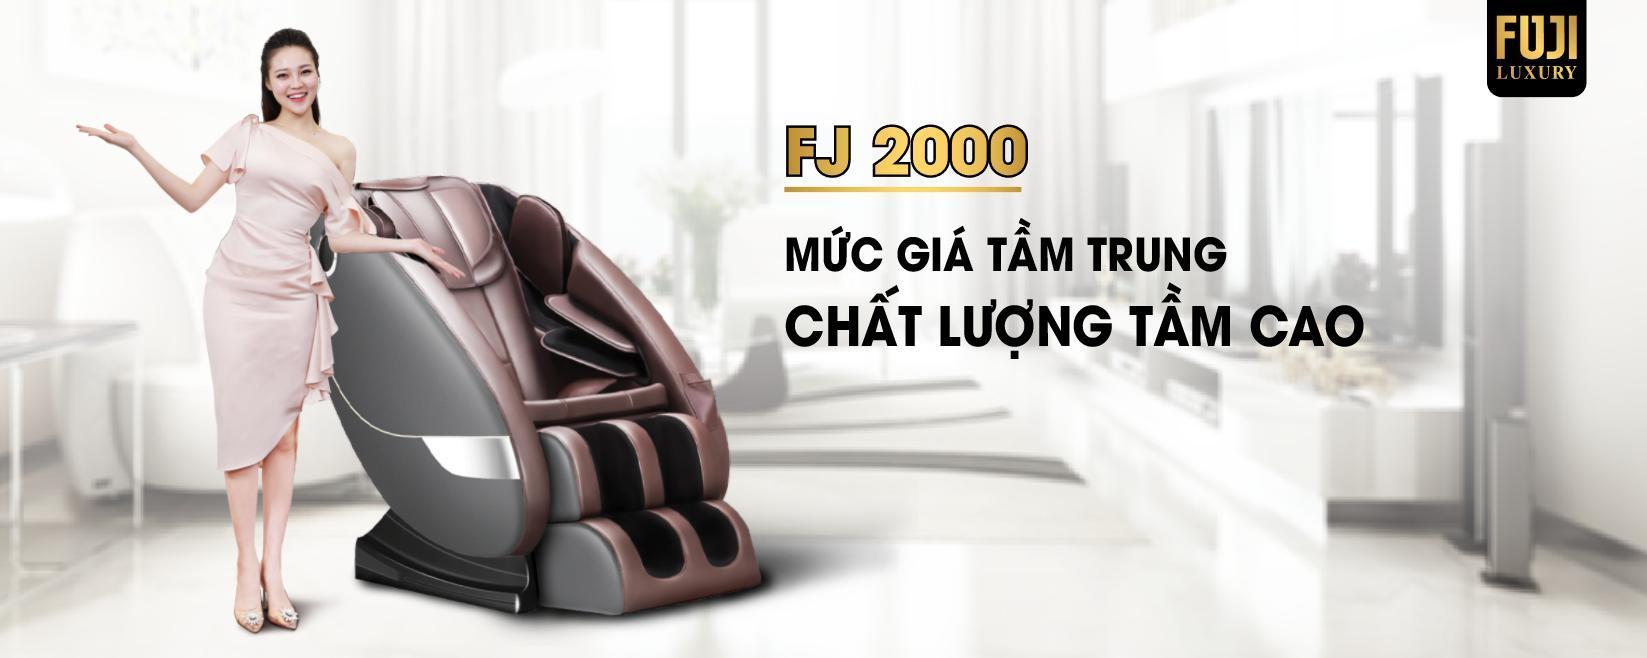 ghế massage giá tốt